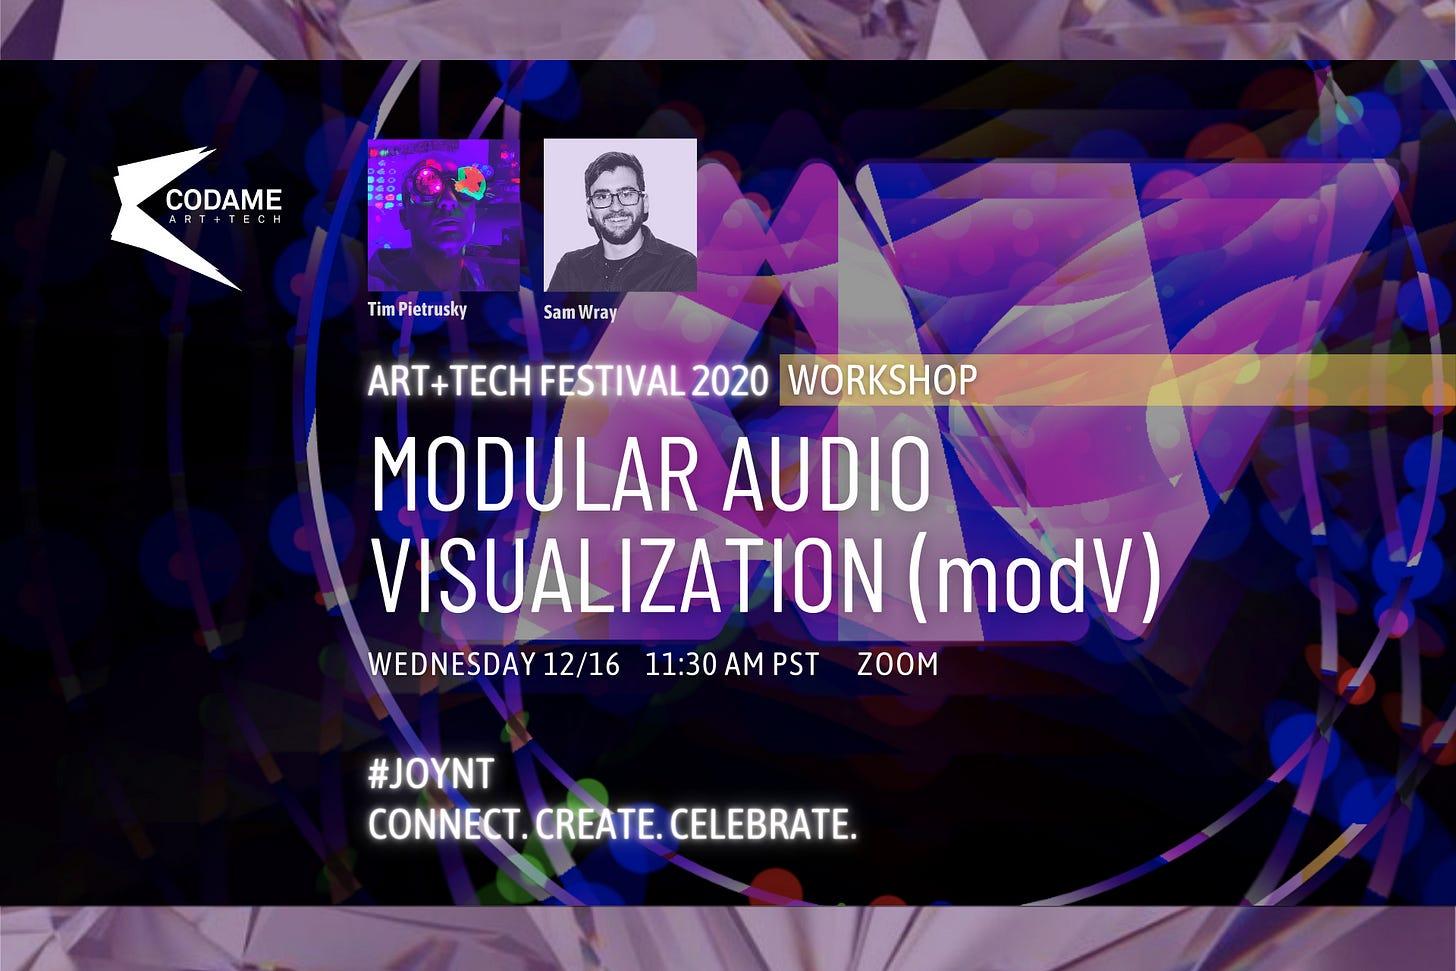 Modular Audio Visualisation with modV